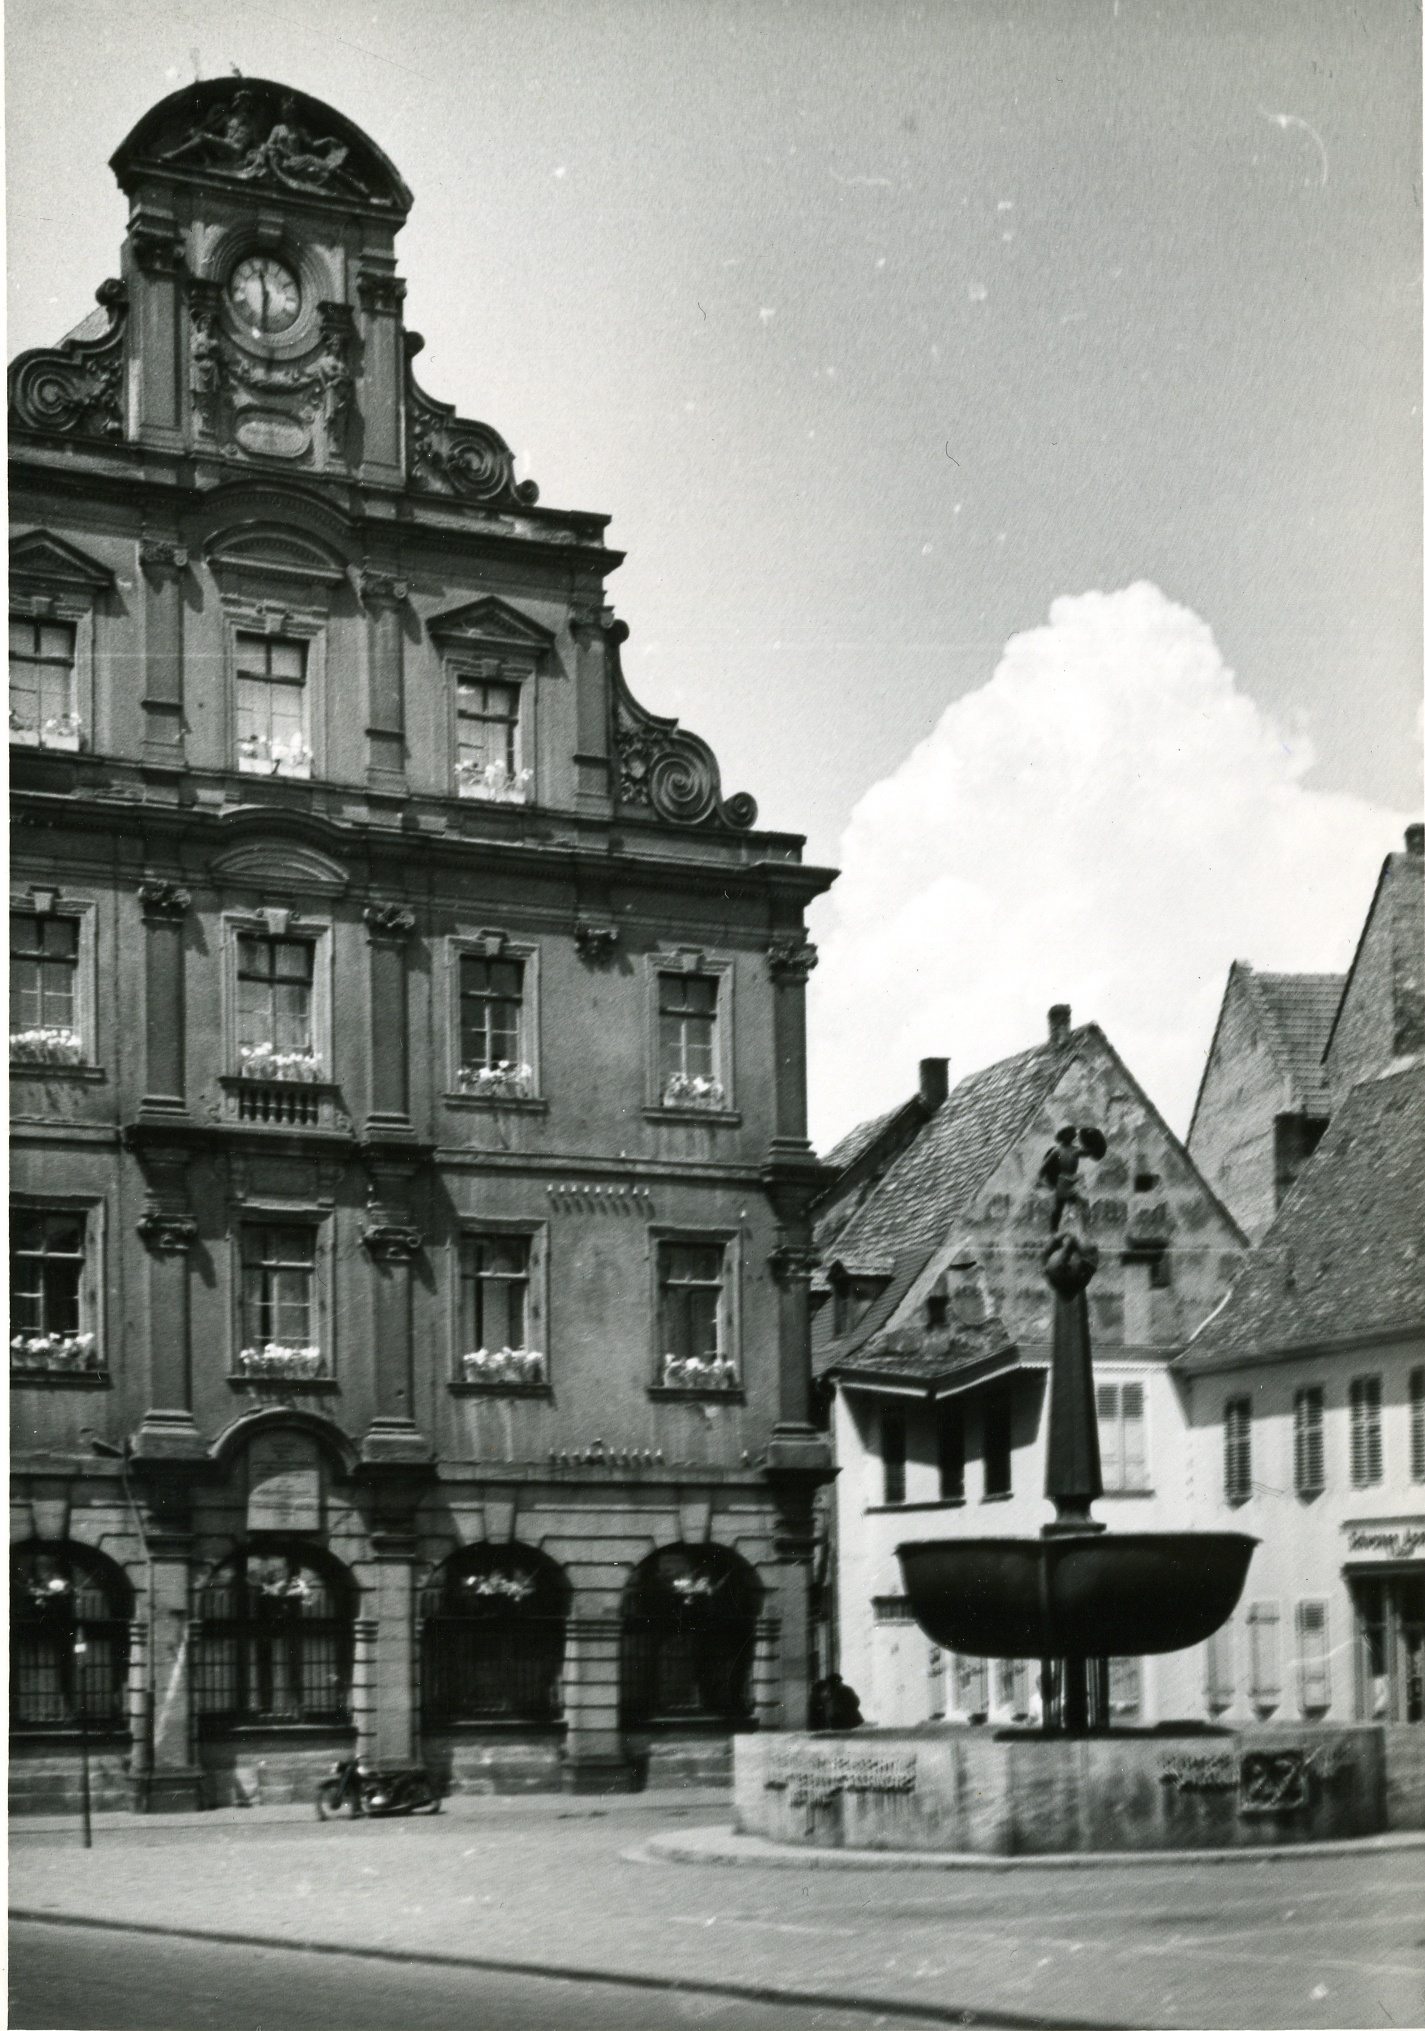 Fotografie Maximilianstraße Alte Münze Vi Historisches Museum